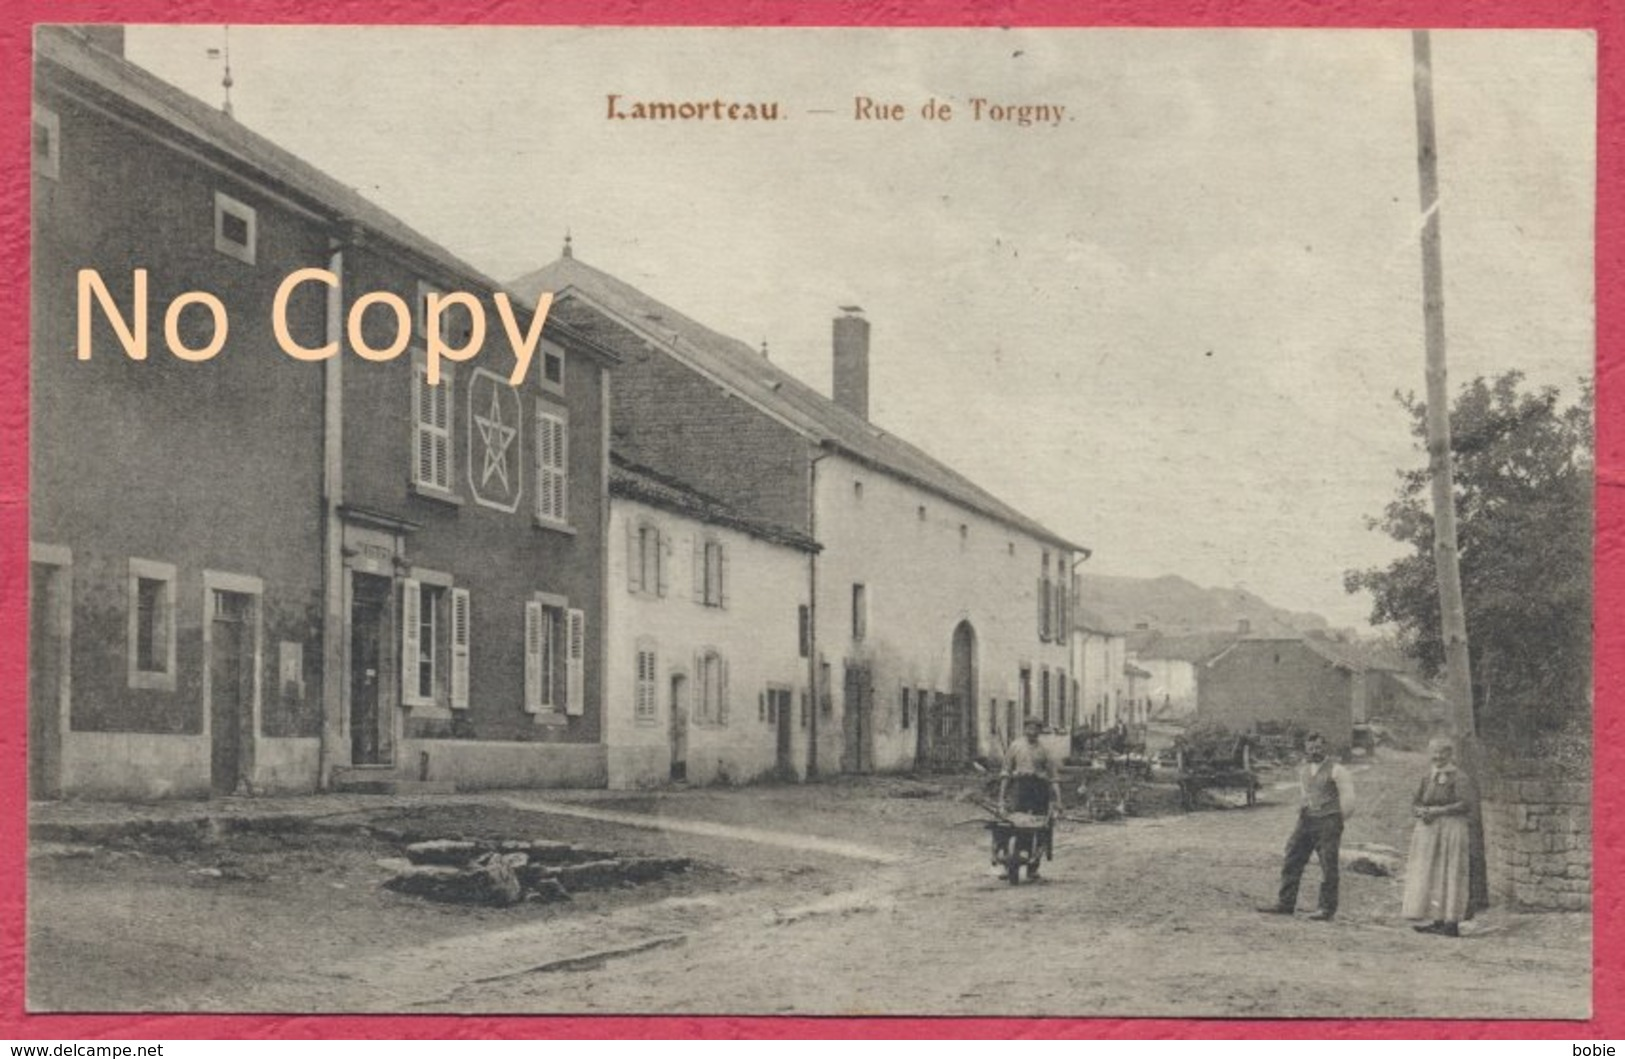 Lamorteau  Belgique : Rue De Torgny - Belgien